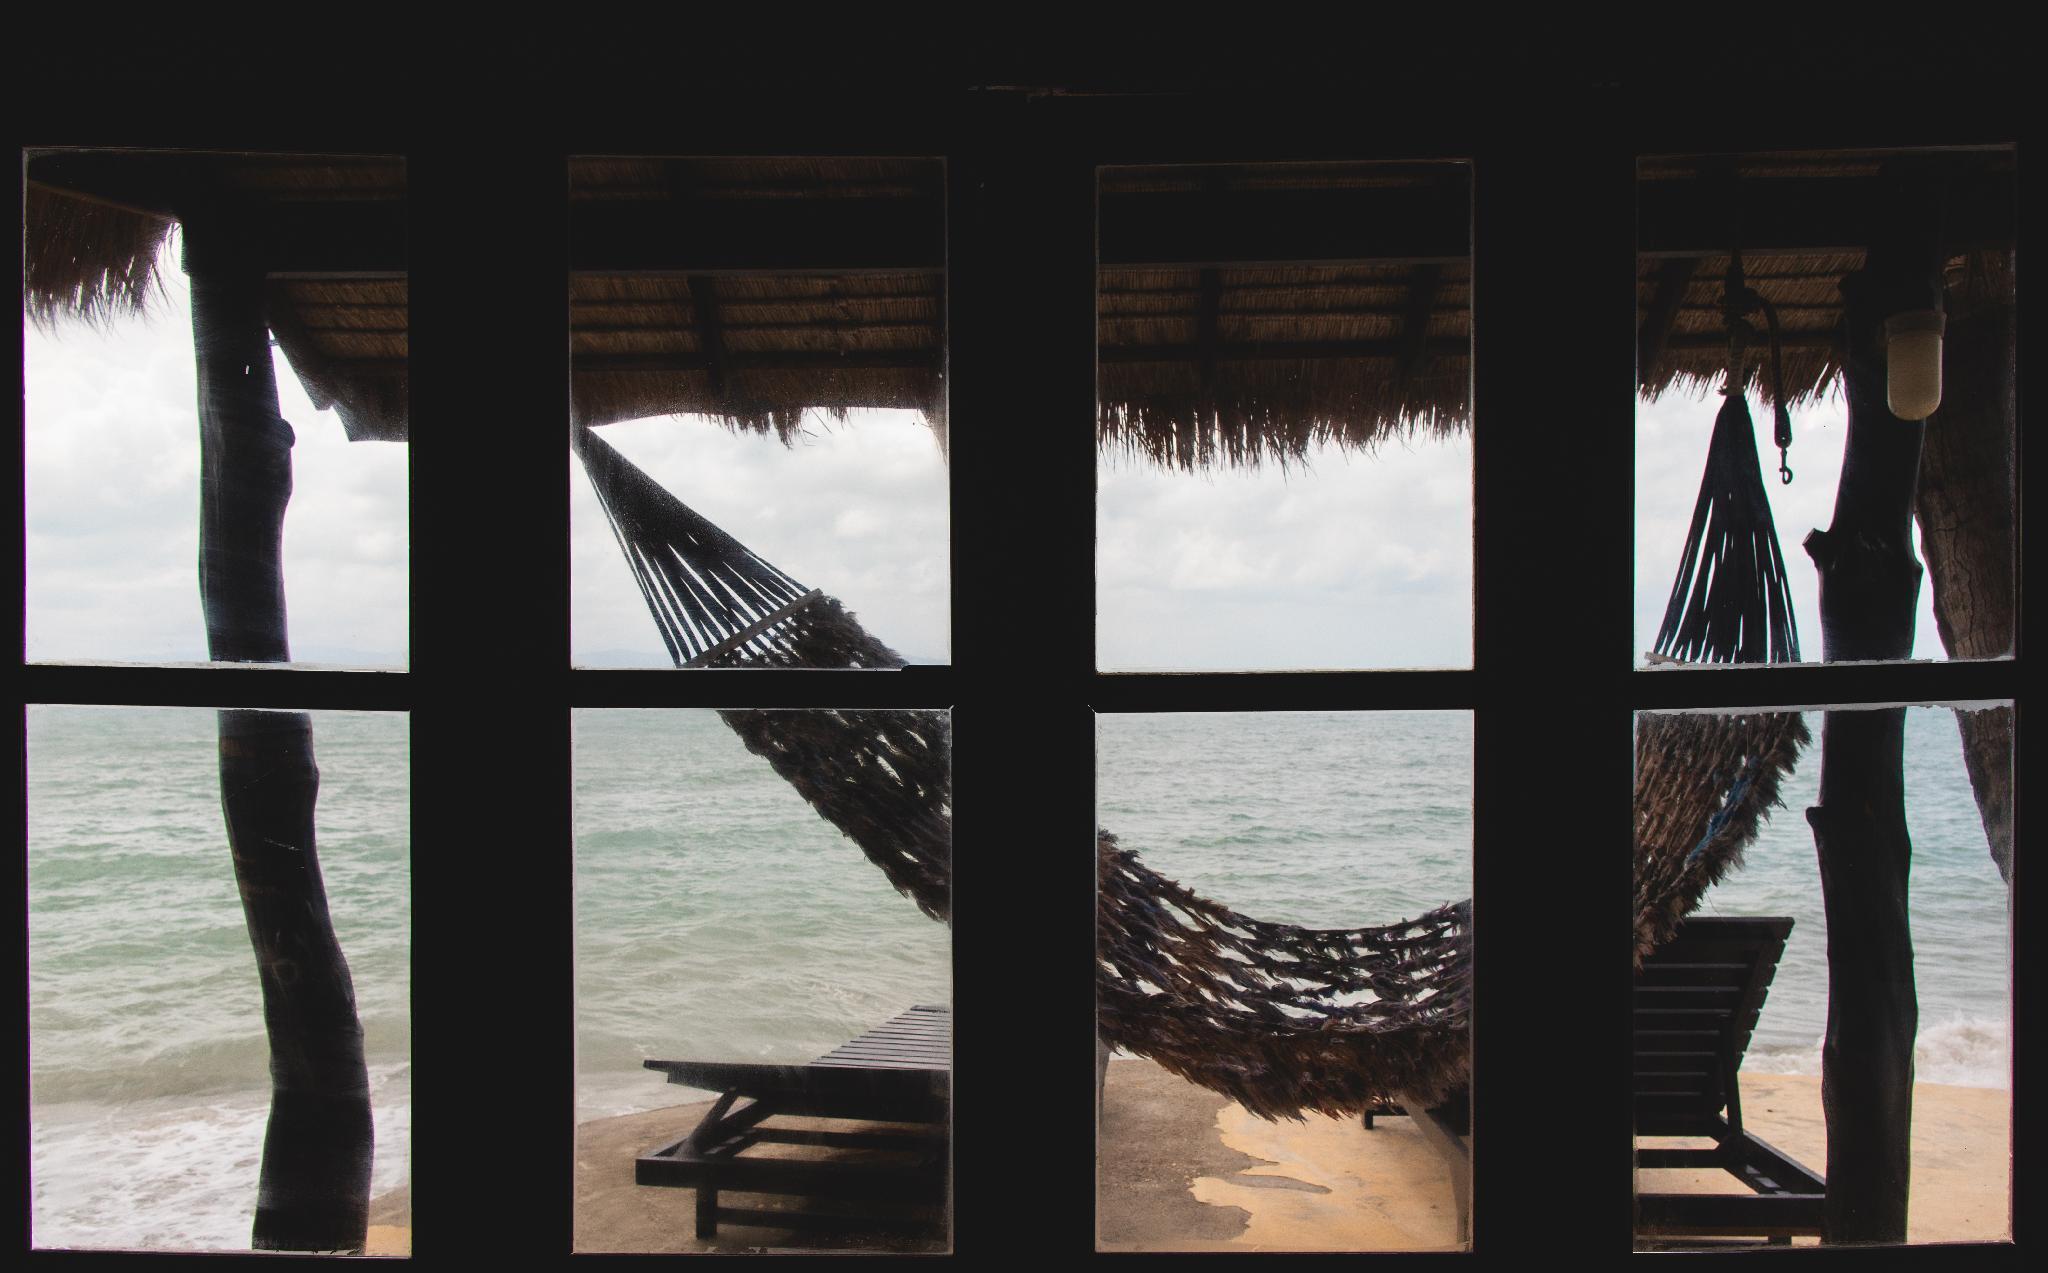 Affordable beachfront accommodation อพาร์ตเมนต์ 15 ห้องนอน 15 ห้องน้ำส่วนตัว ขนาด 3800 ตร.ม. – ท้องศาลา